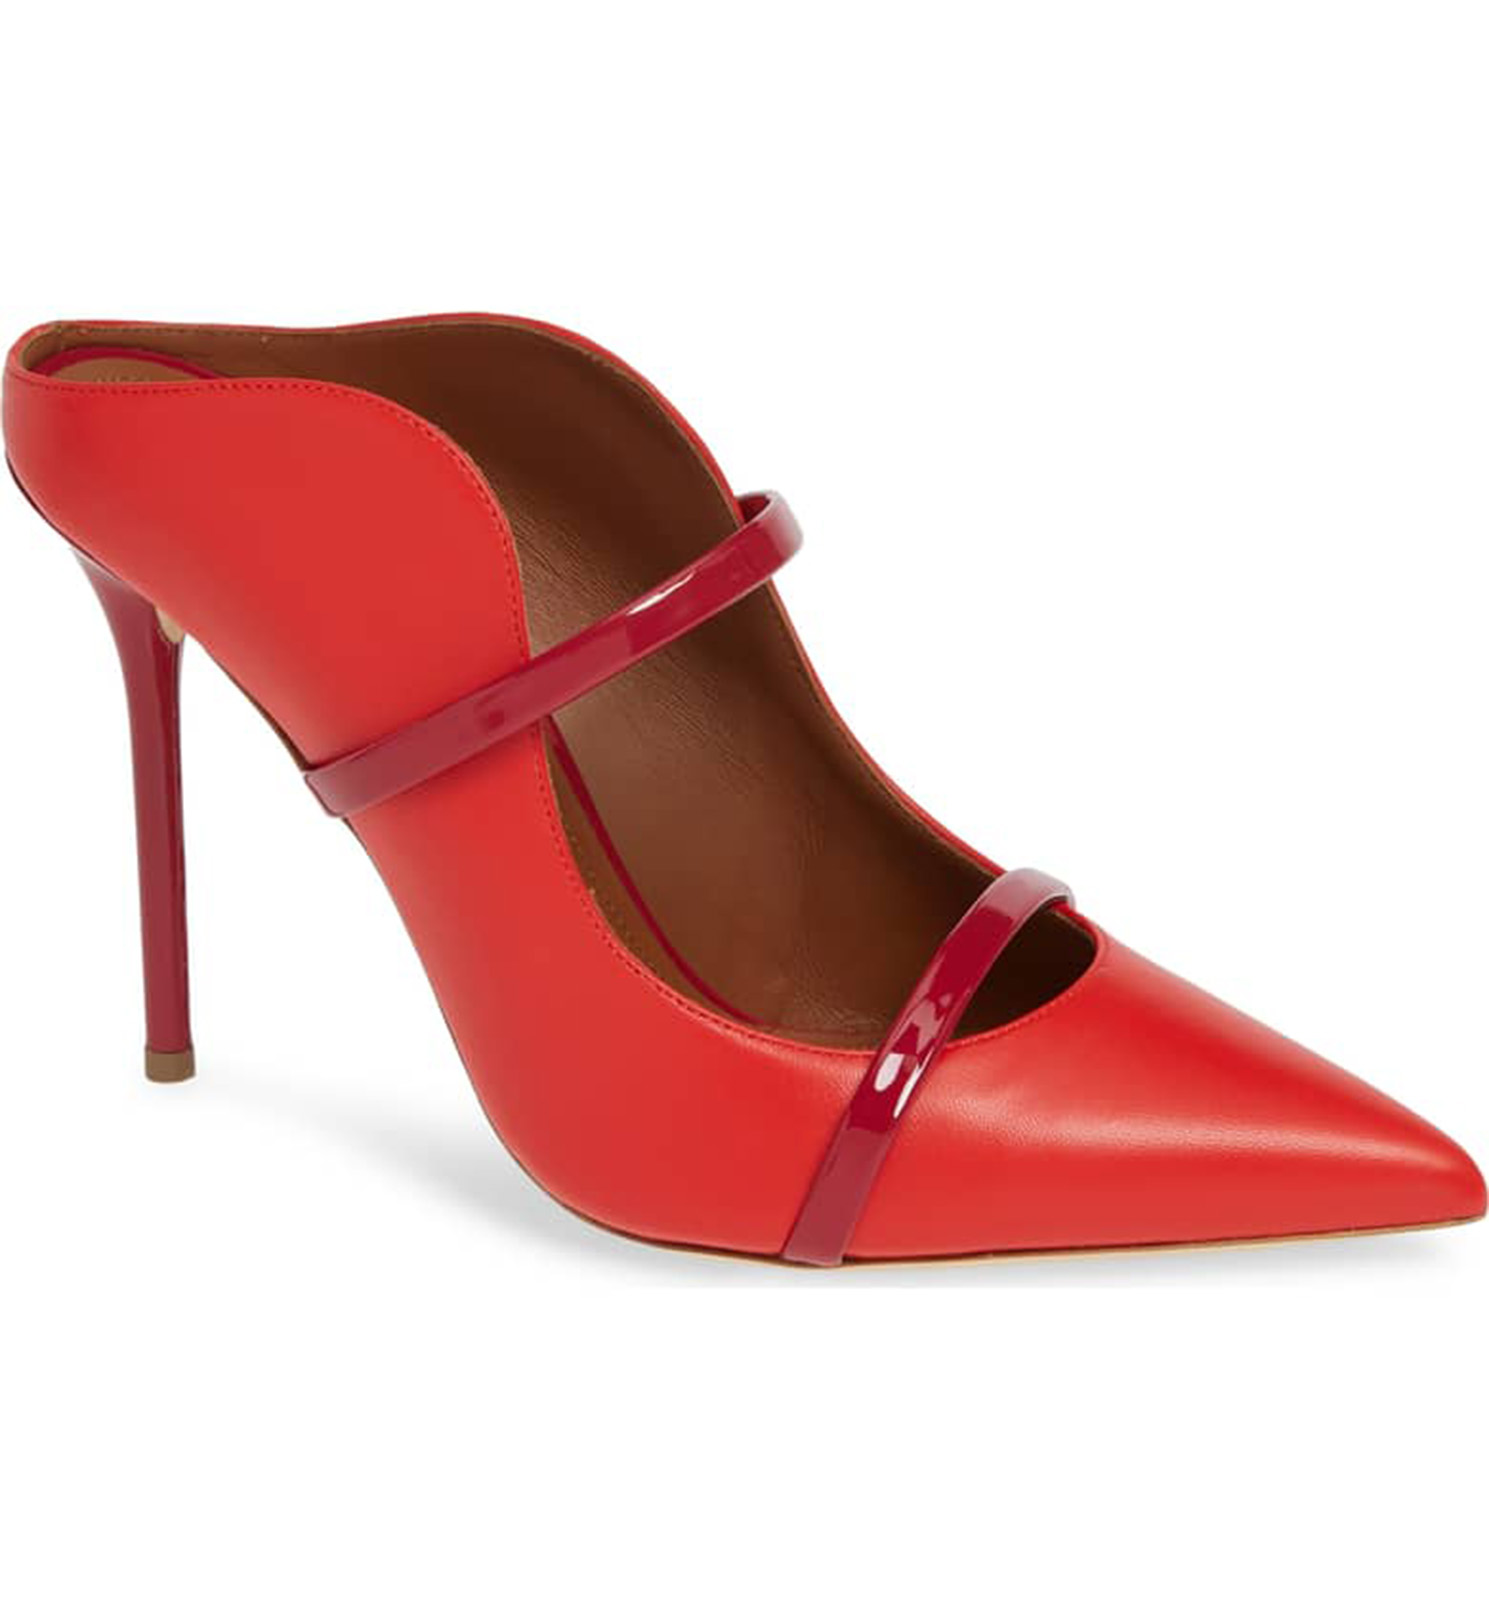 Zapatos Malone Souliers, modelo Maureen, de Nordstrom.